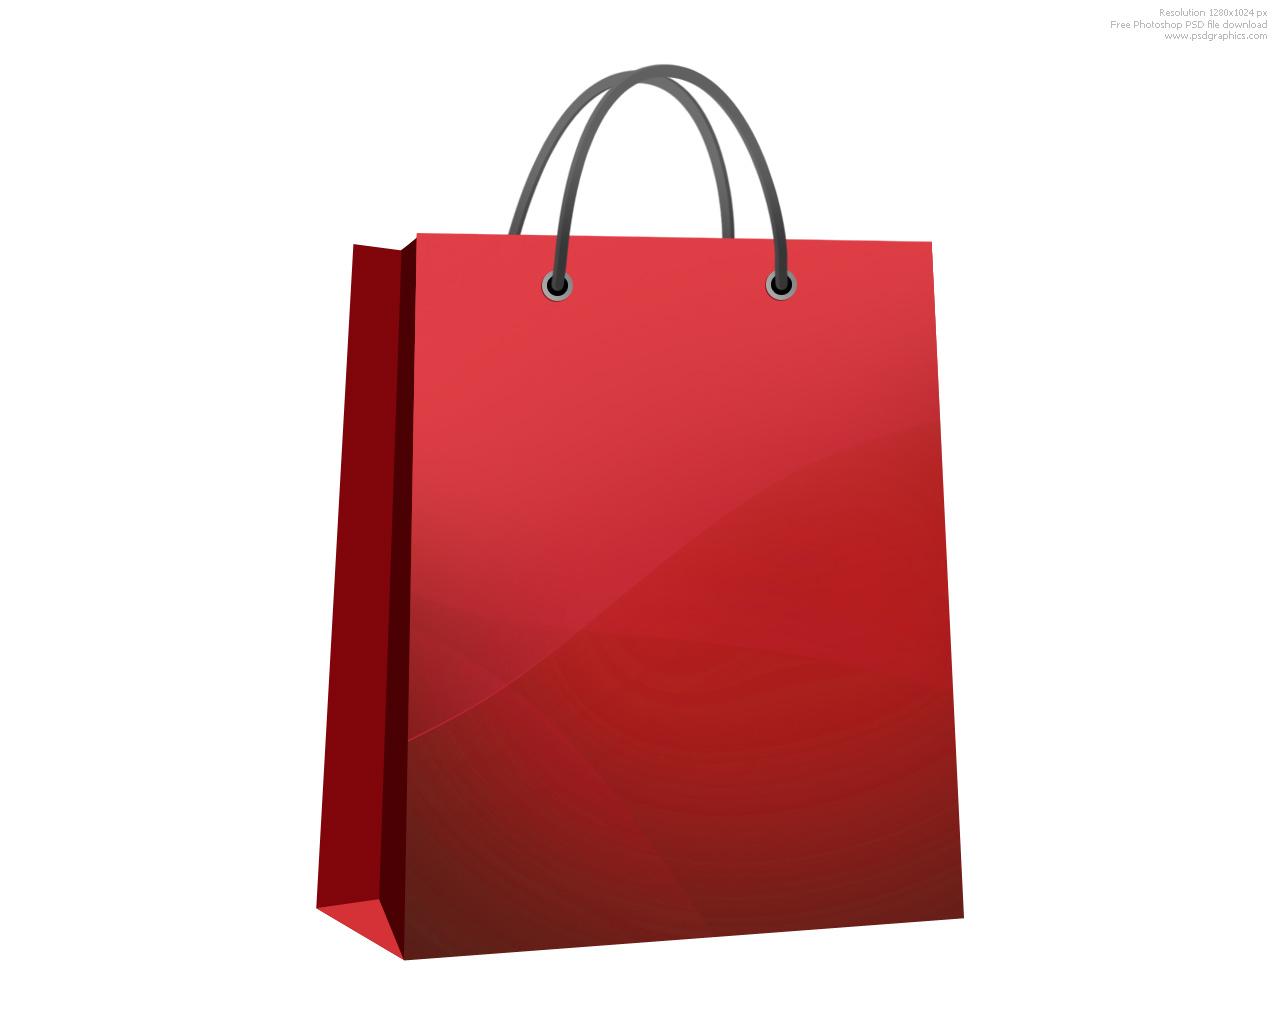 Shopping Bag Clipart-shopping bag clipart-11